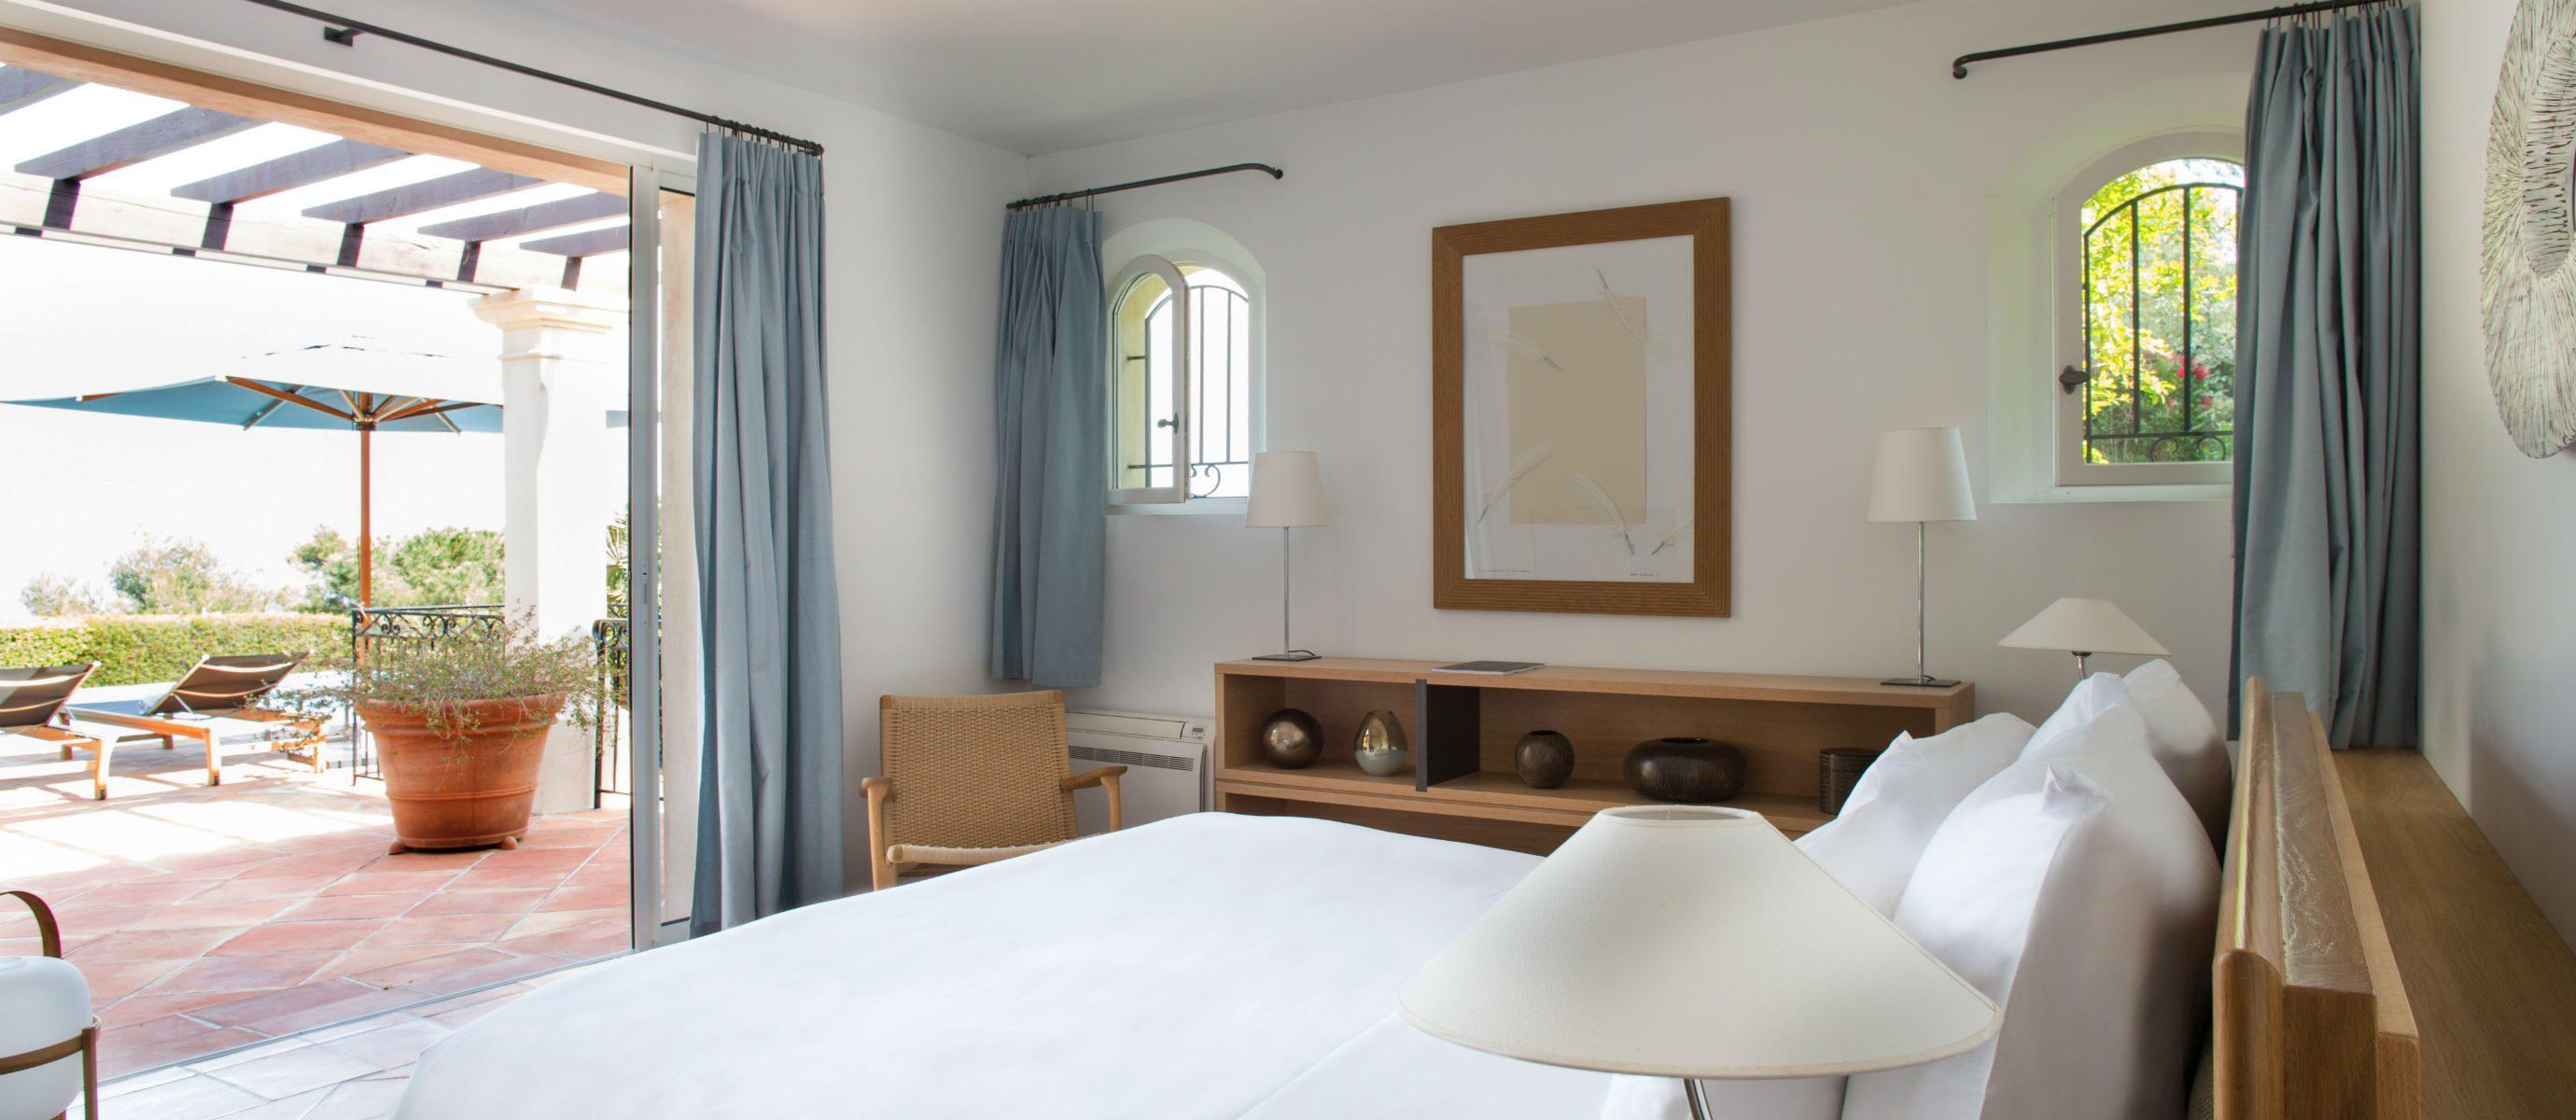 Villa-5.MAIN6-La-Reserve-Ramatuelle-Room-4